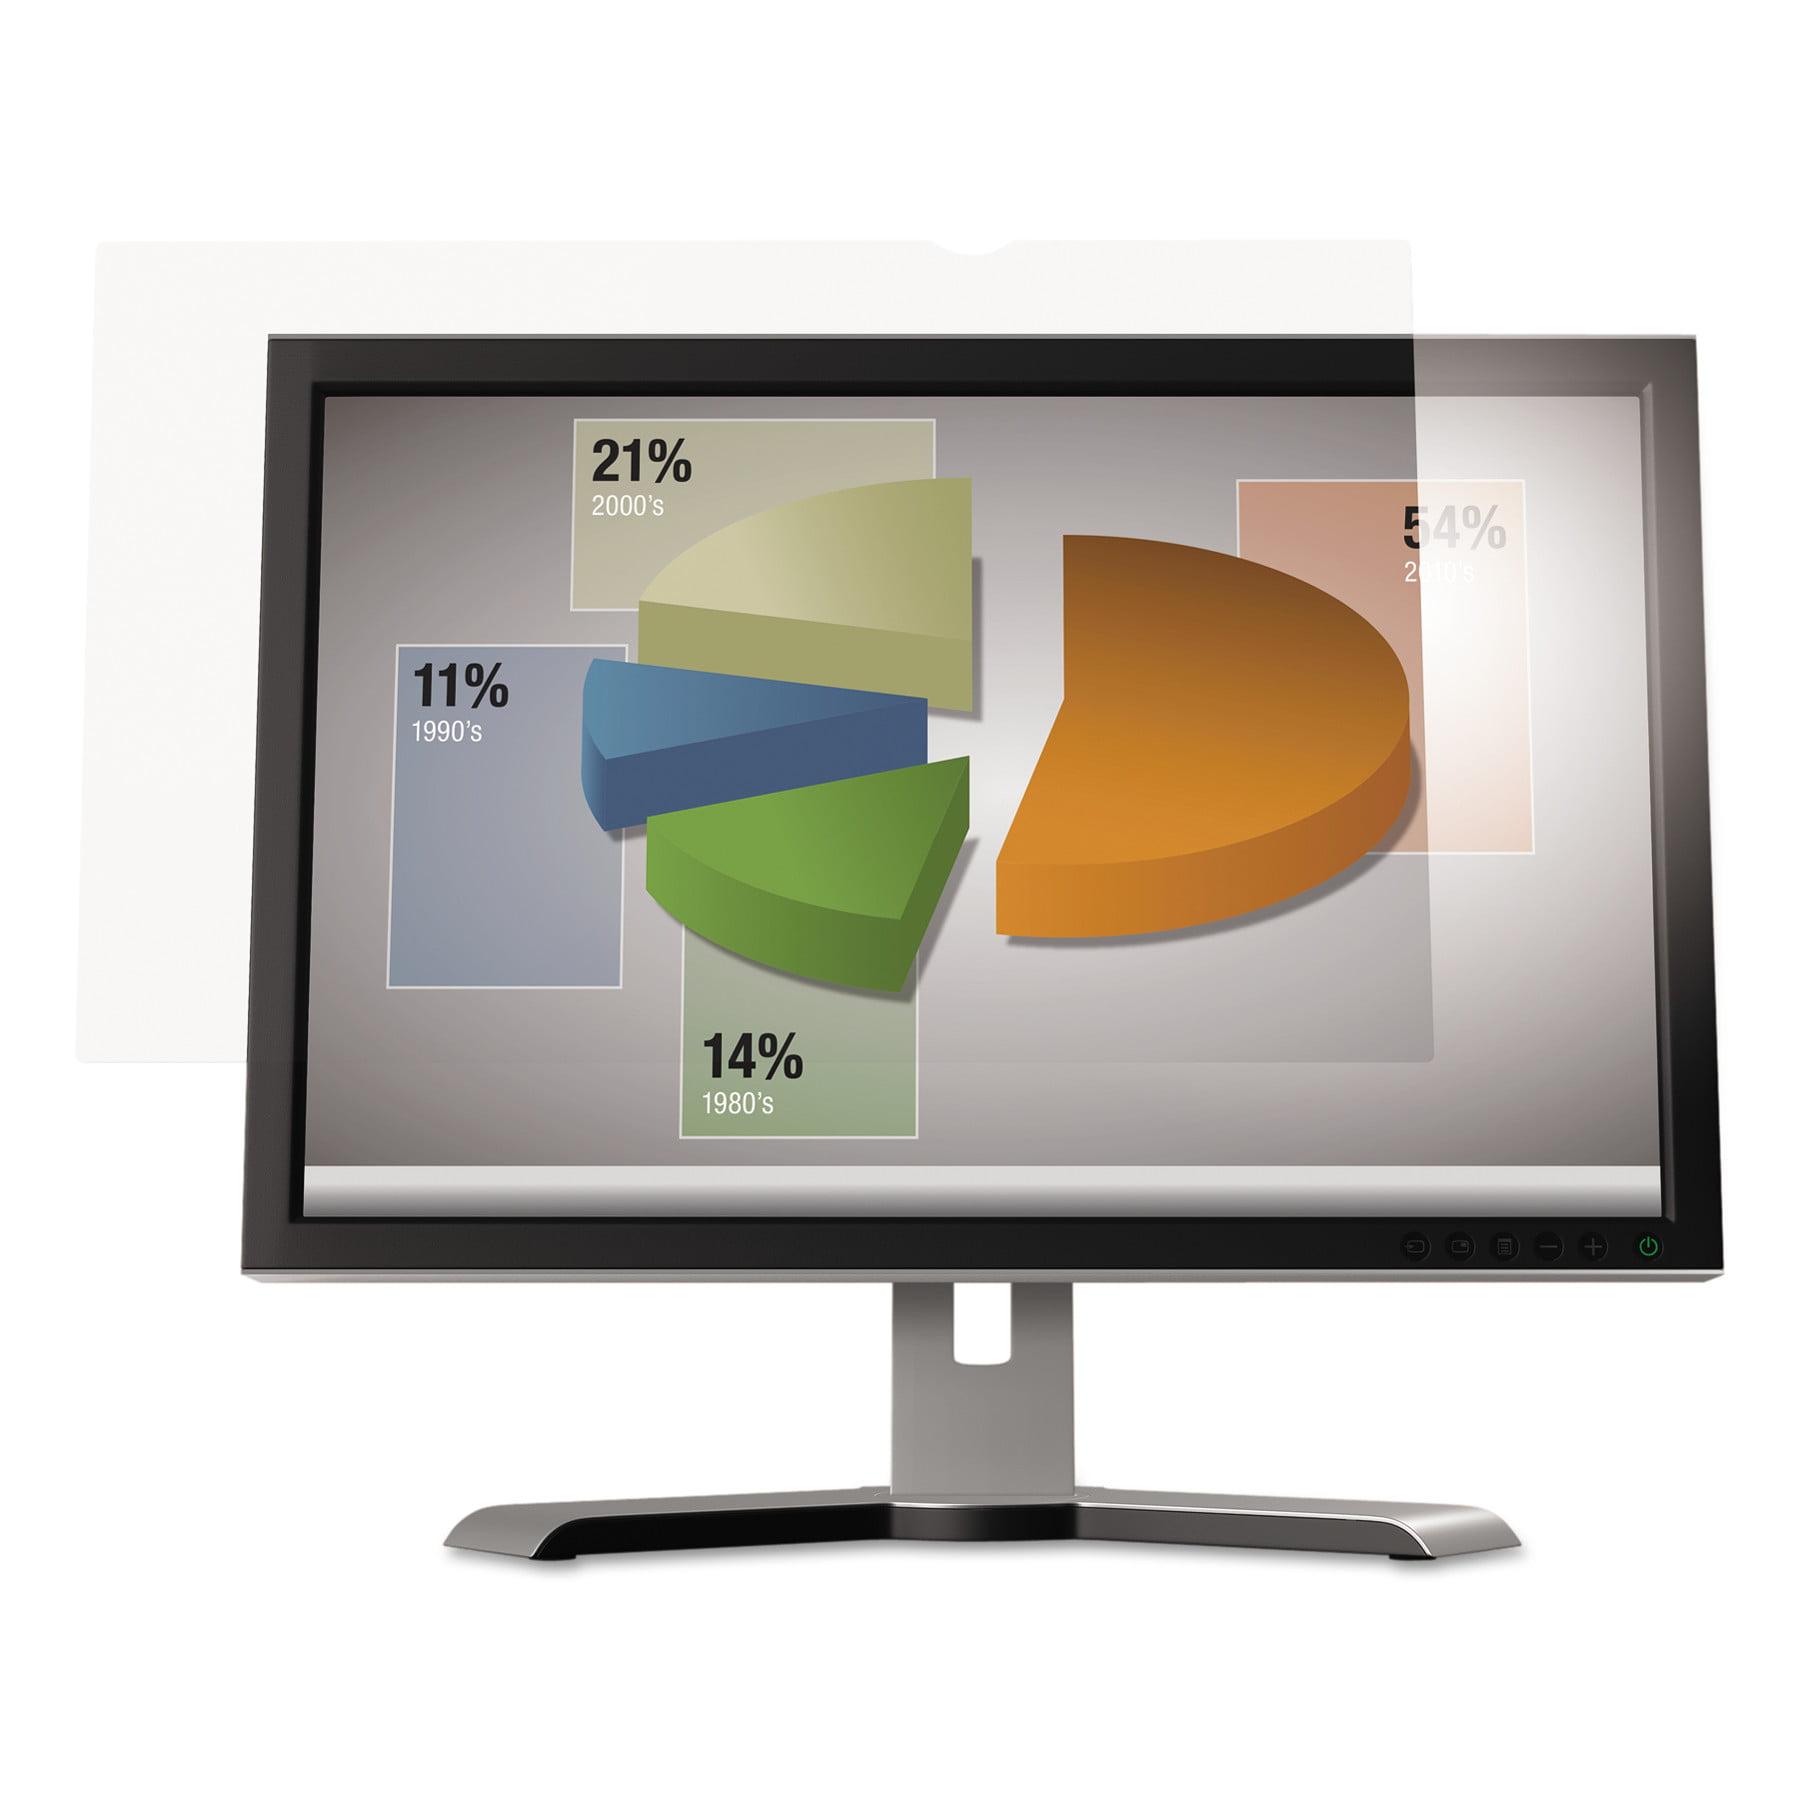 "3M Antiglare Flatscreen Frameless Monitor Filters for 23.6"" Widescreen LCD, 16:9"